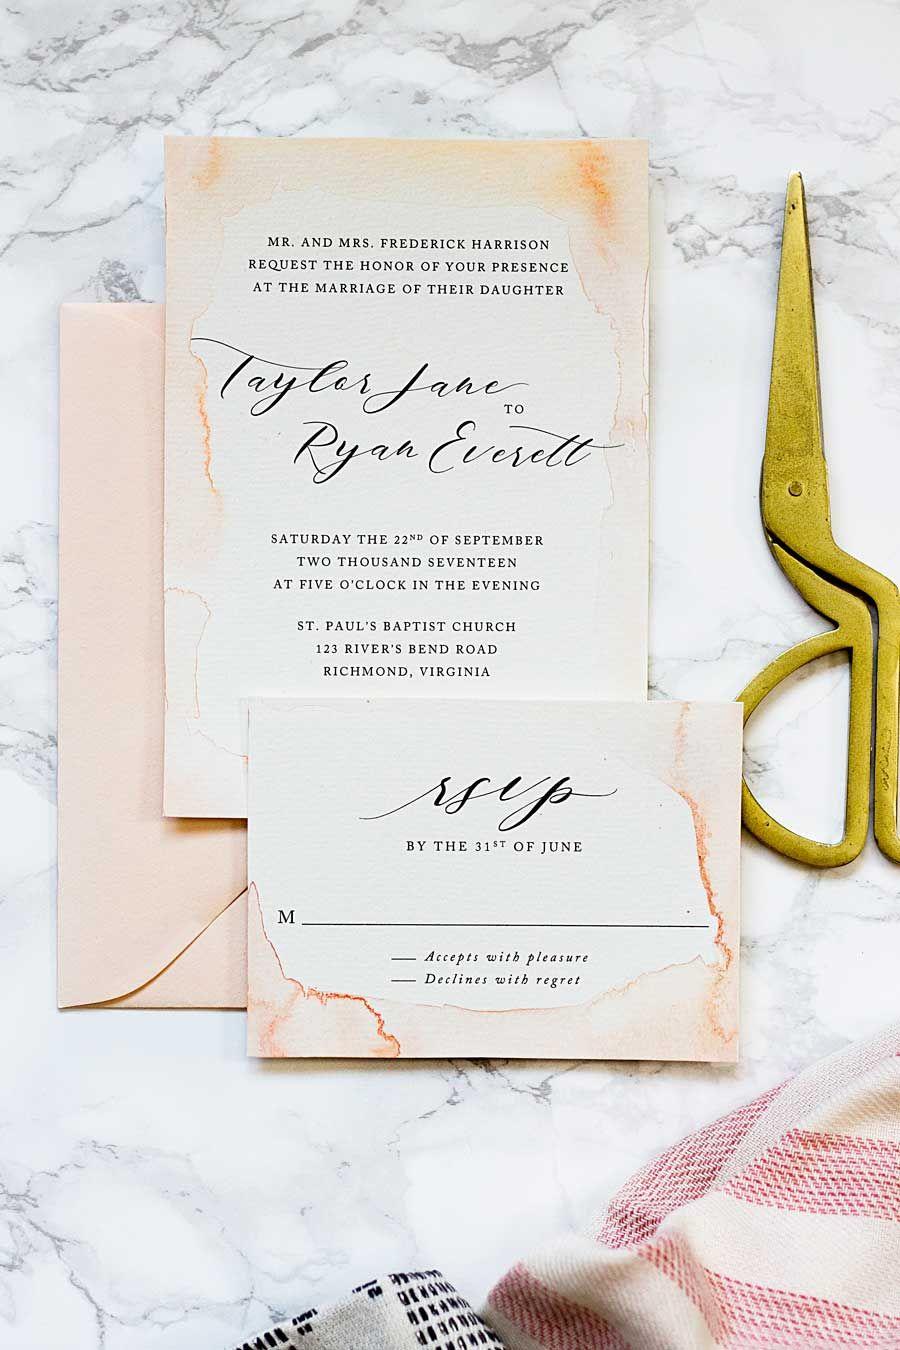 The Coolest Watercolor Wedding Invitations Of Different Styles Elegantweddinginvites Com Blog Make Your Own Wedding Invitations Summer Wedding Invitations Wedding Invitations Diy